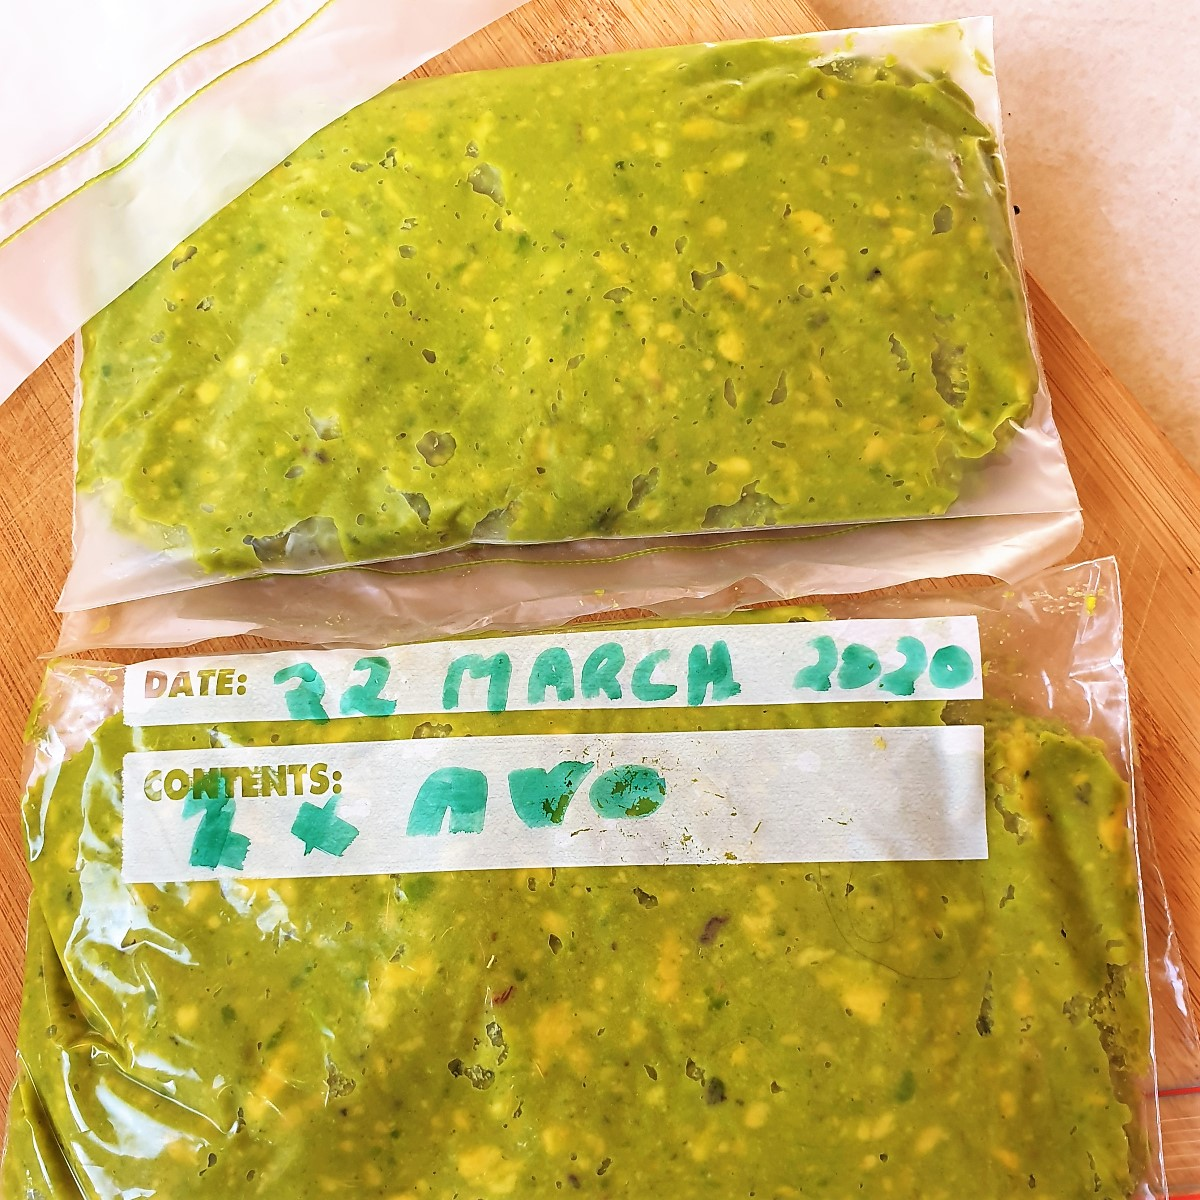 Mashed avocado packed into a freezer bag.